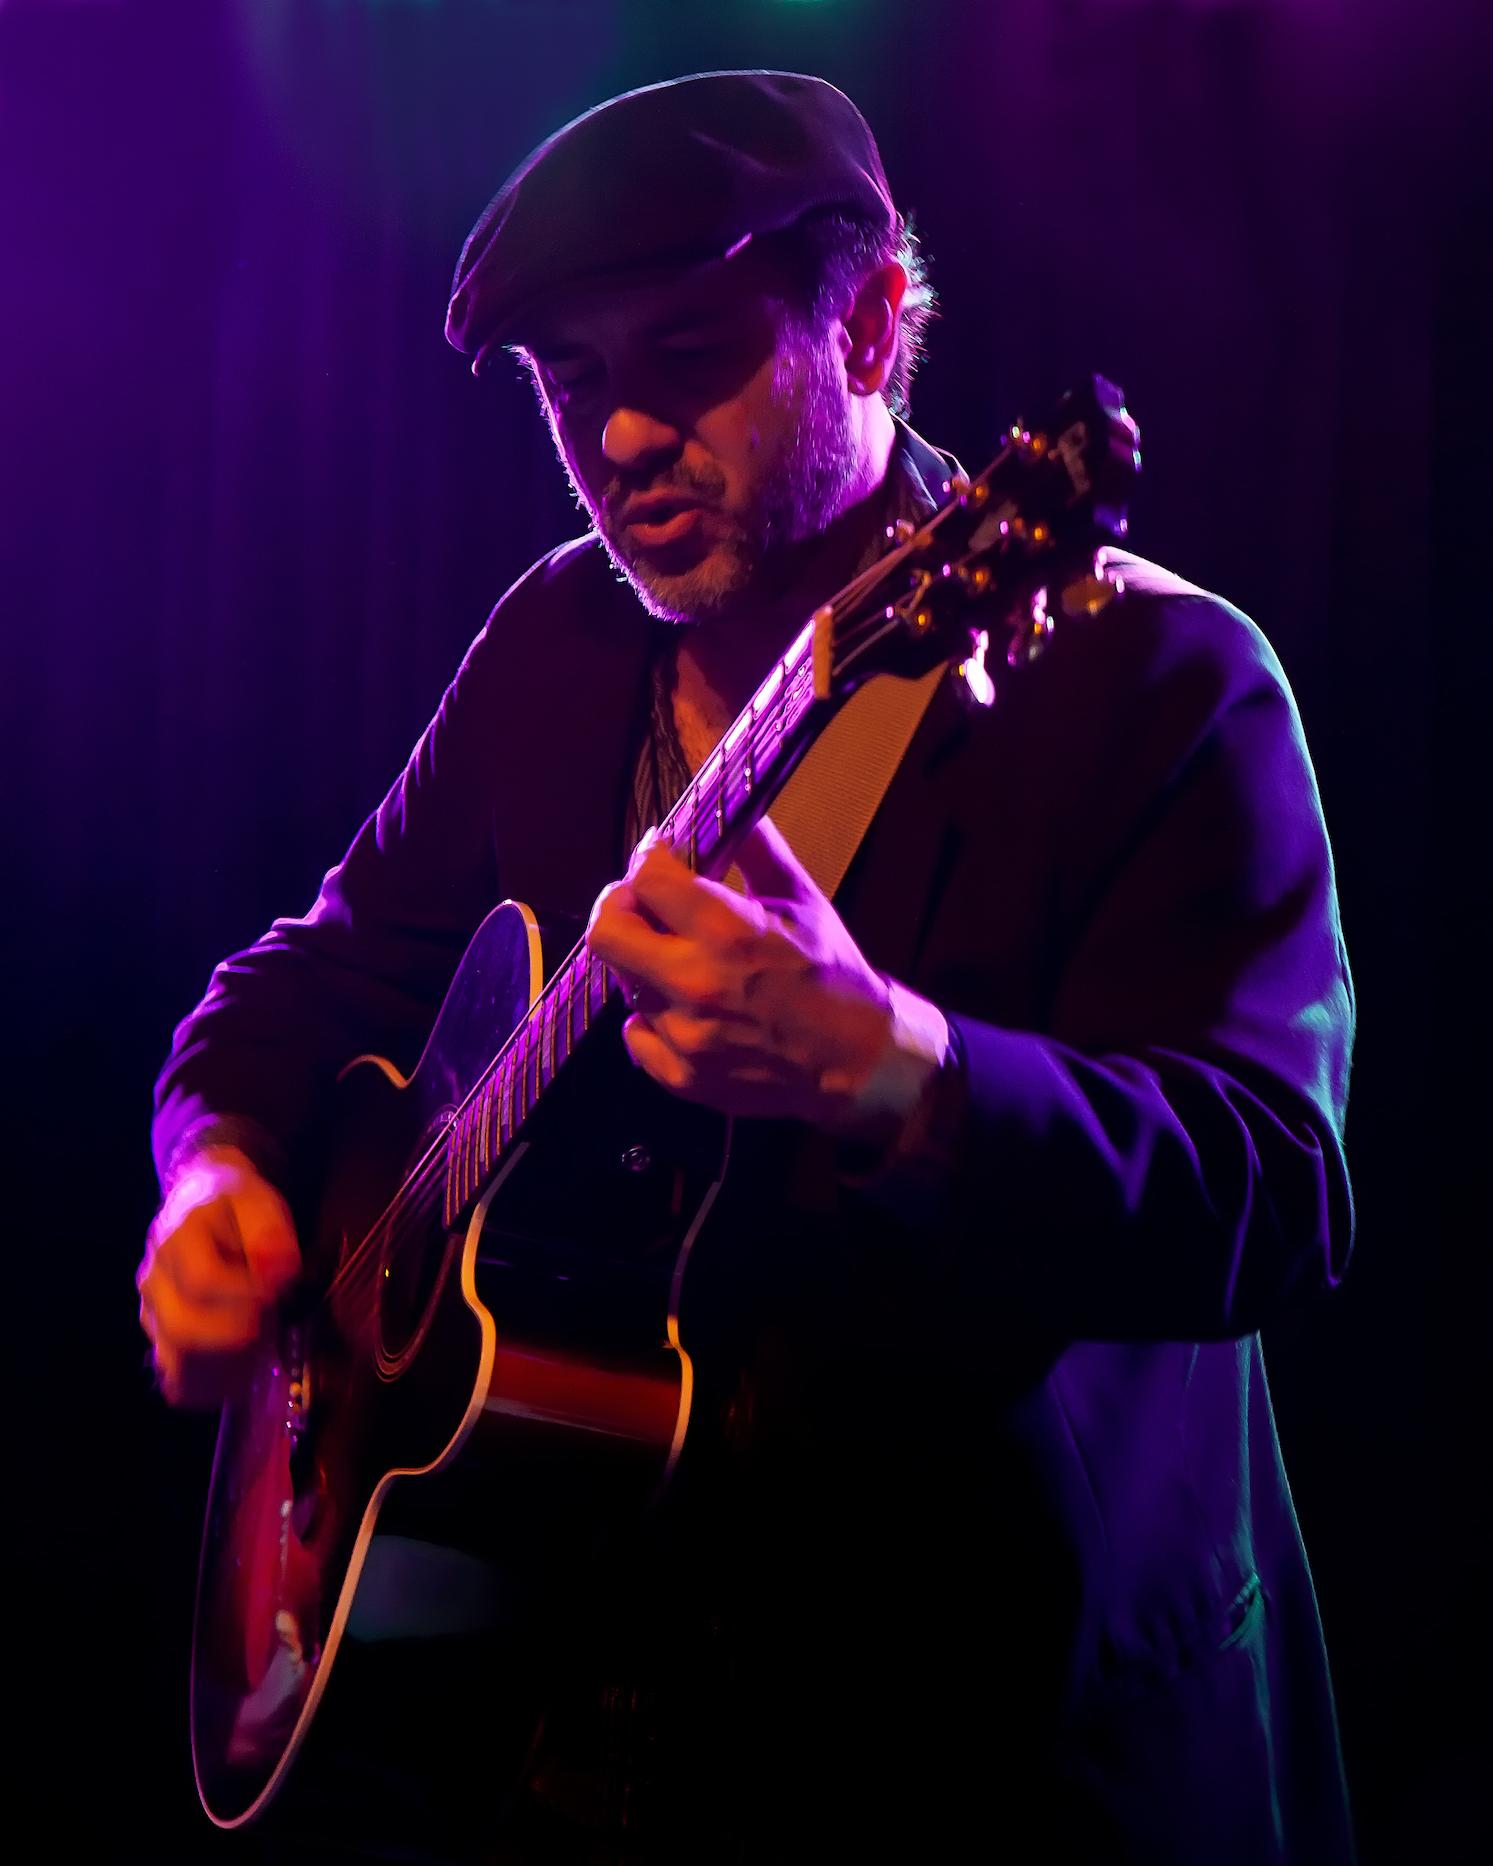 Jon performing live